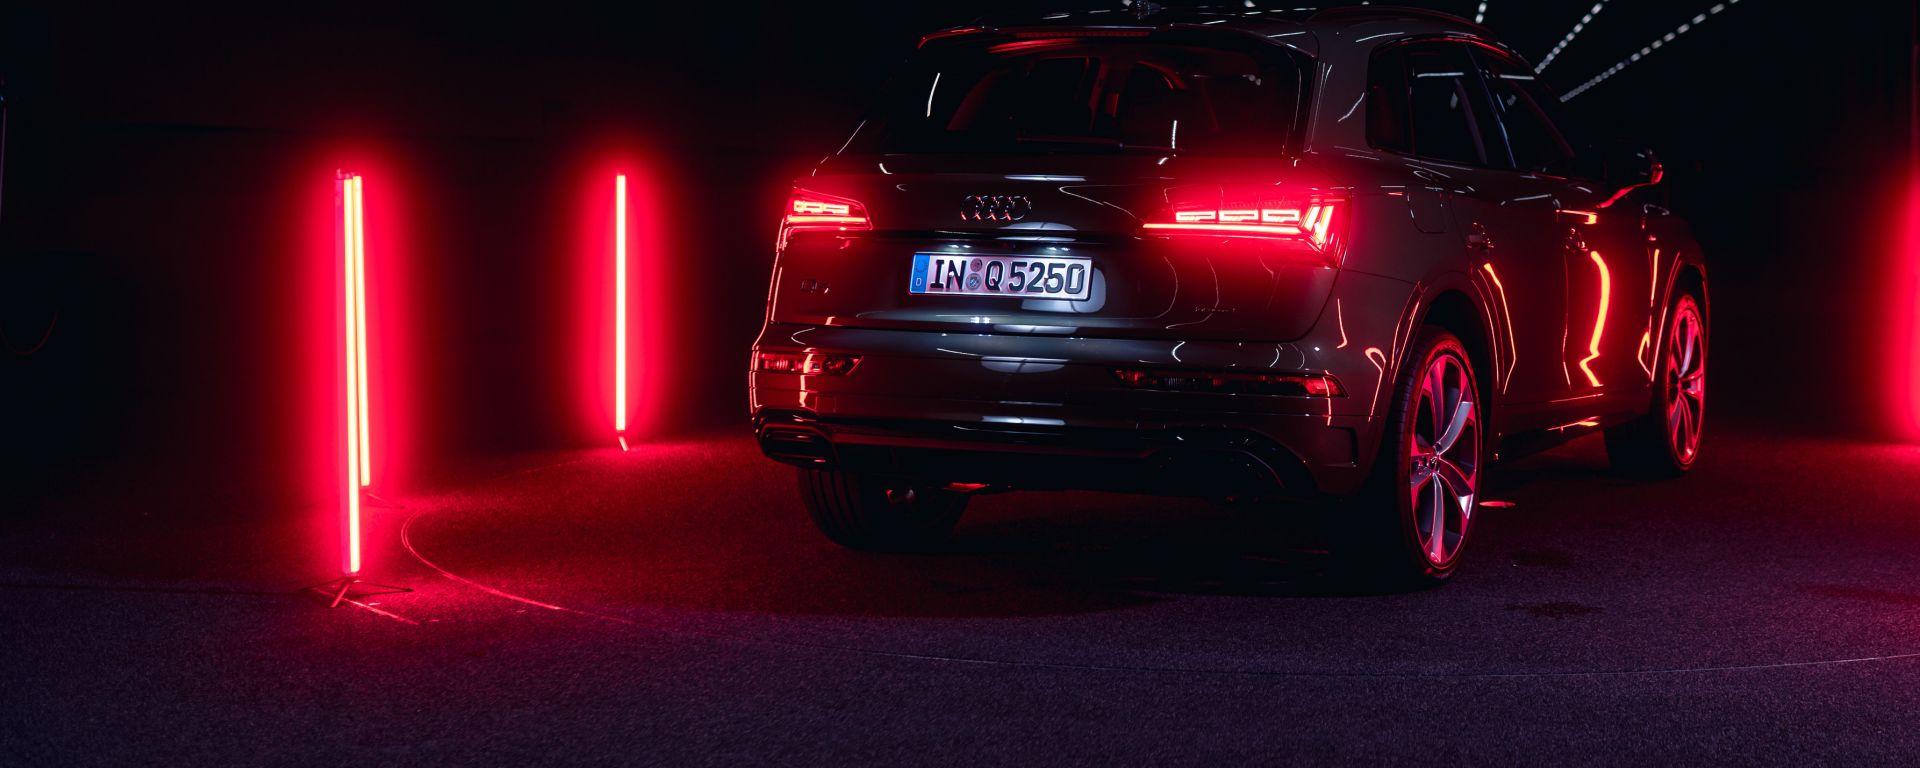 Audi Q5 2021, fari posteriori Digital OLED